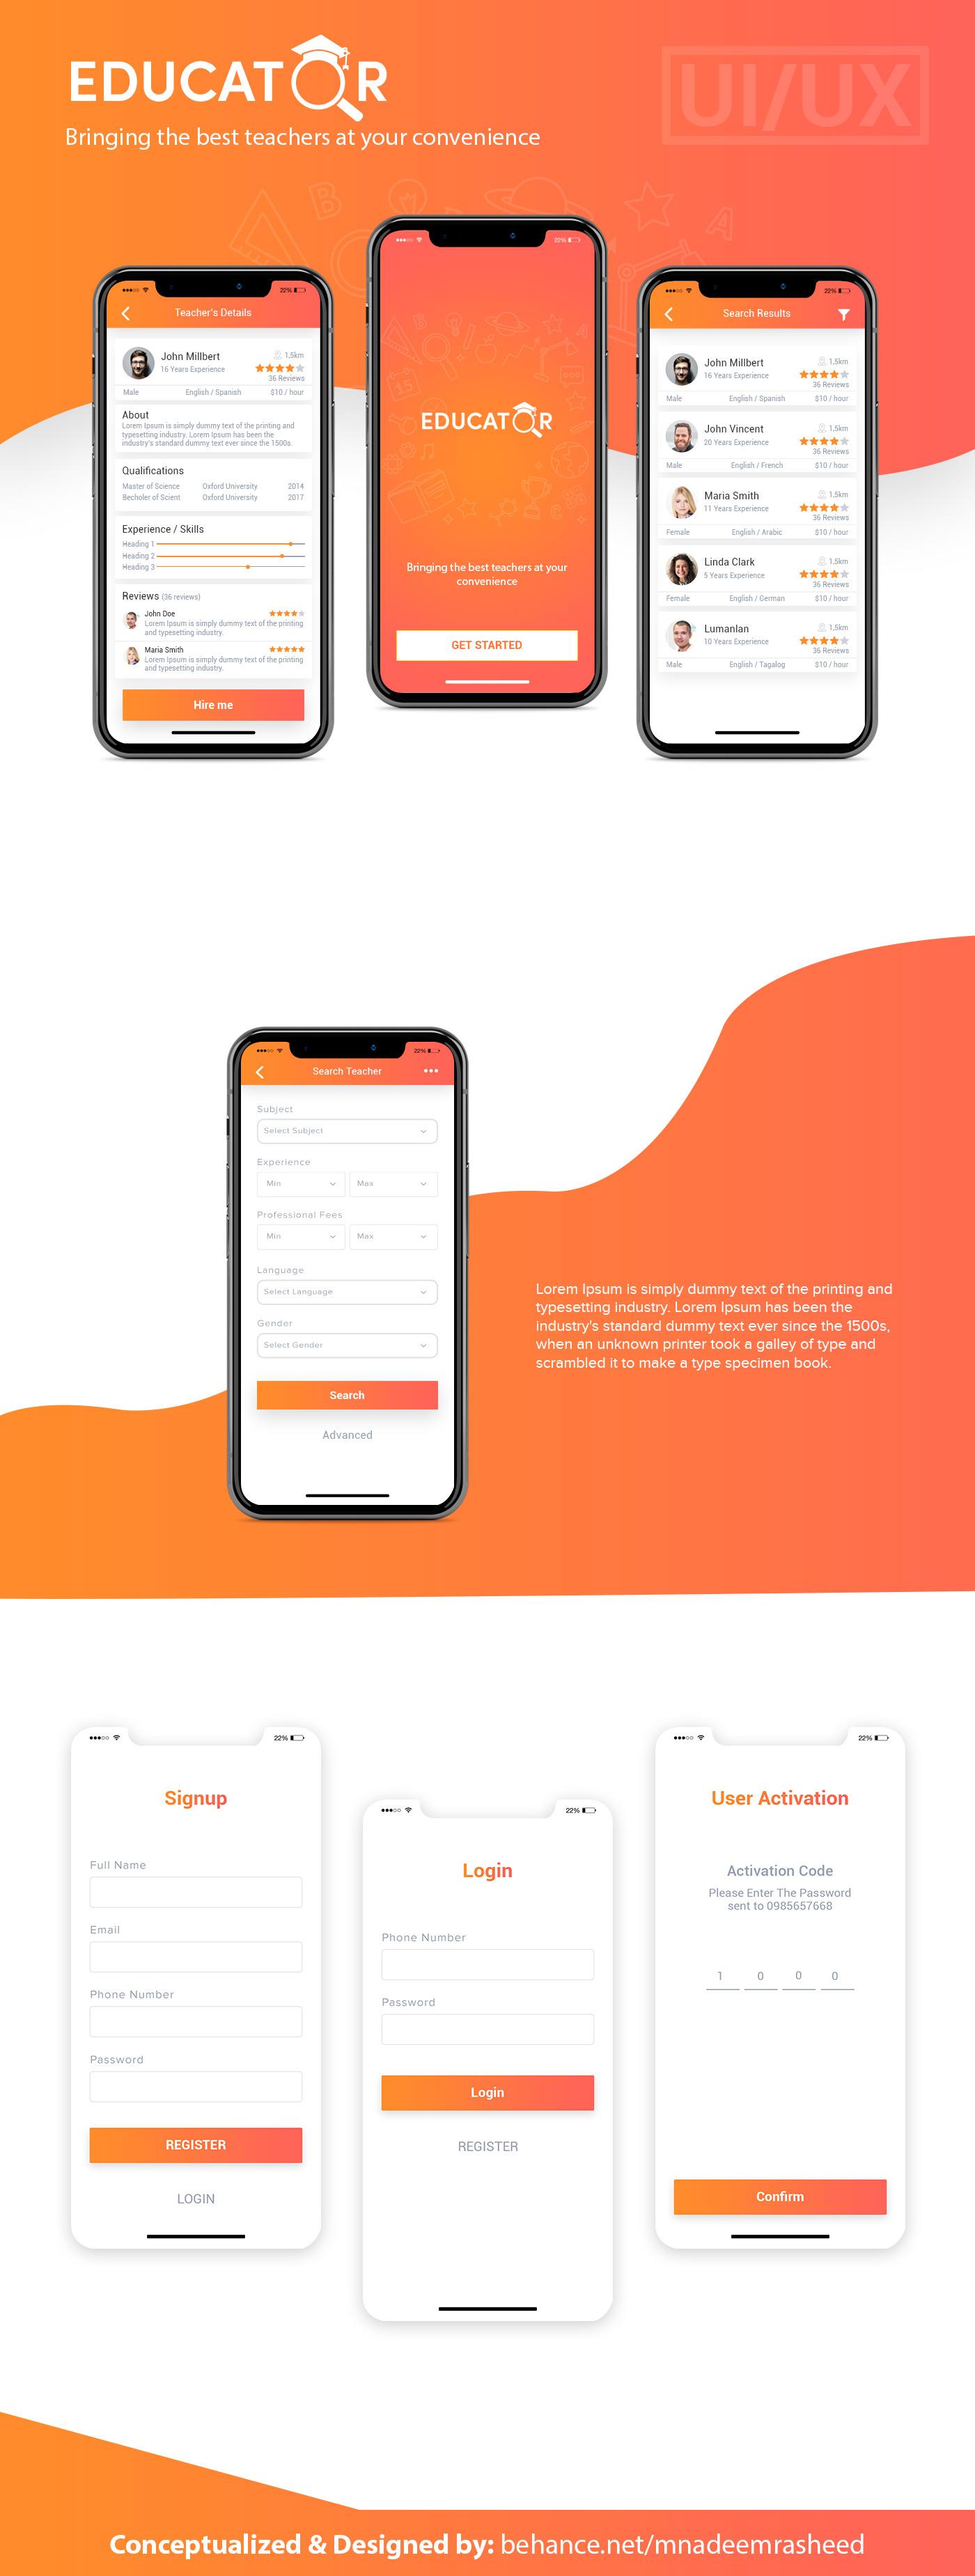 teacher finder app Mobile app Mobile Application Design hire teacher app study app education app iOS App Android App creative mobile app